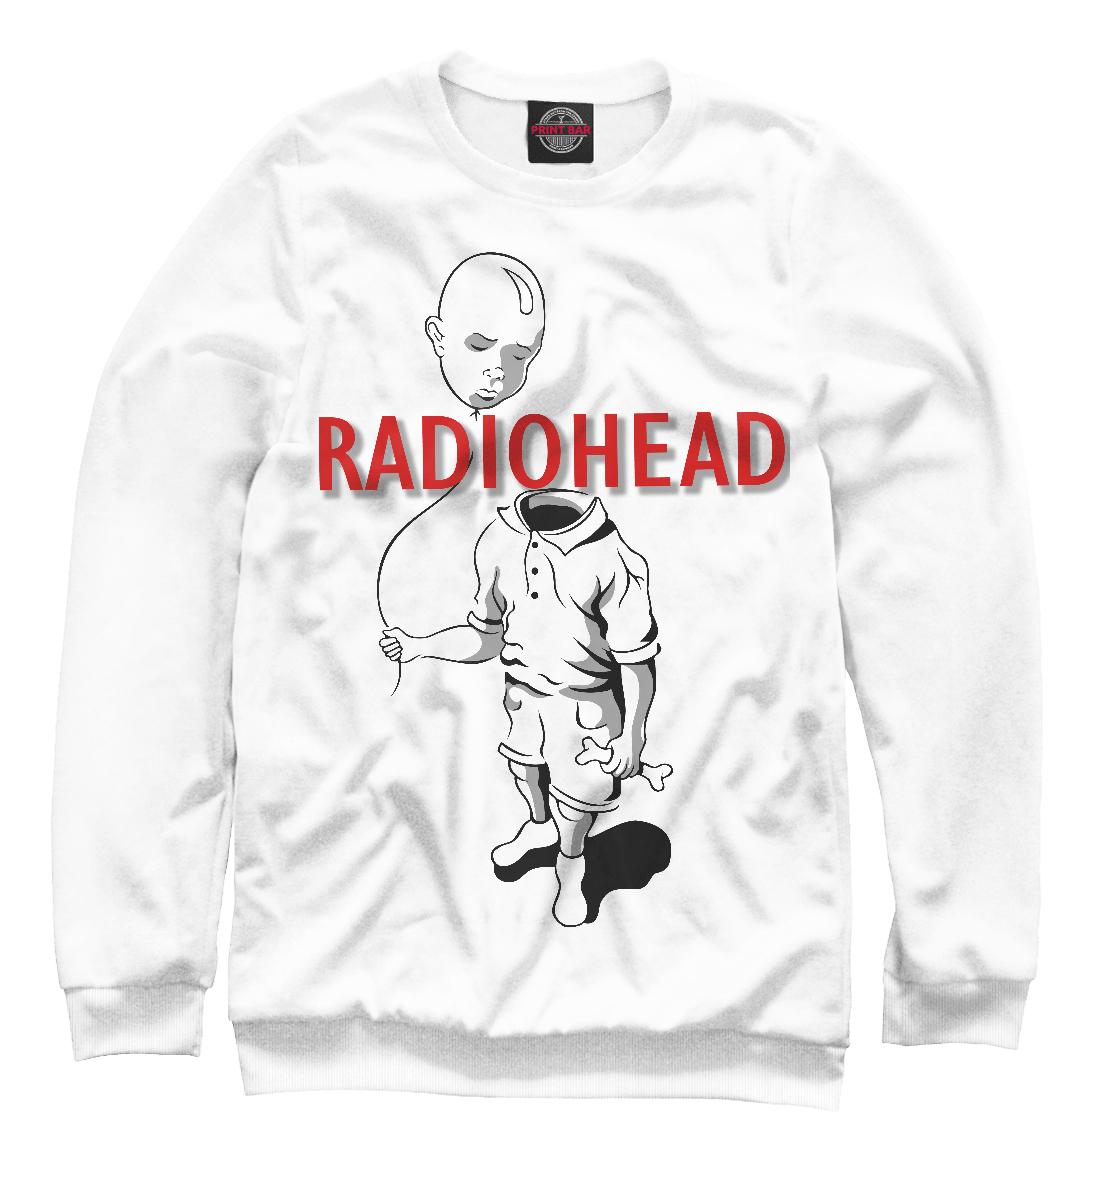 Купить Radiohead, Printbar, Свитшоты, RDH-780890-swi-2